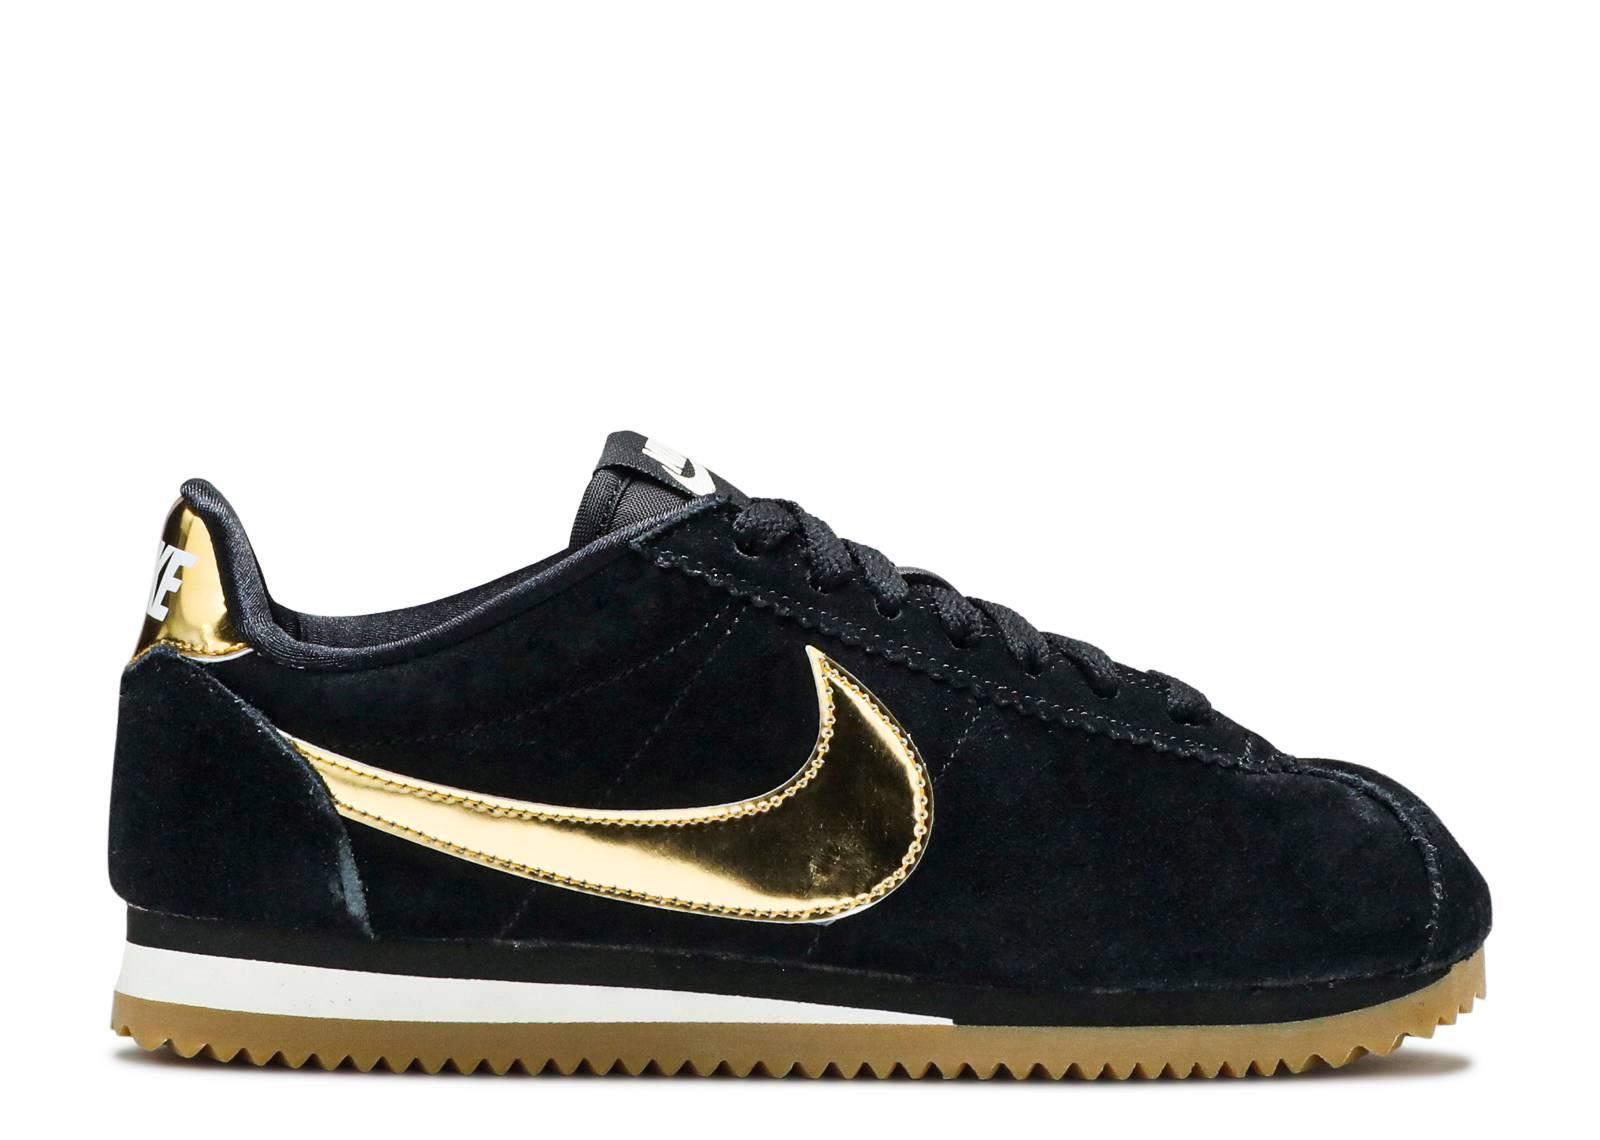 best website 53361 89b02 Wmns Classic Cortez Se - Nike - 902856 014 - black metallic gold-phantom    Flight Club